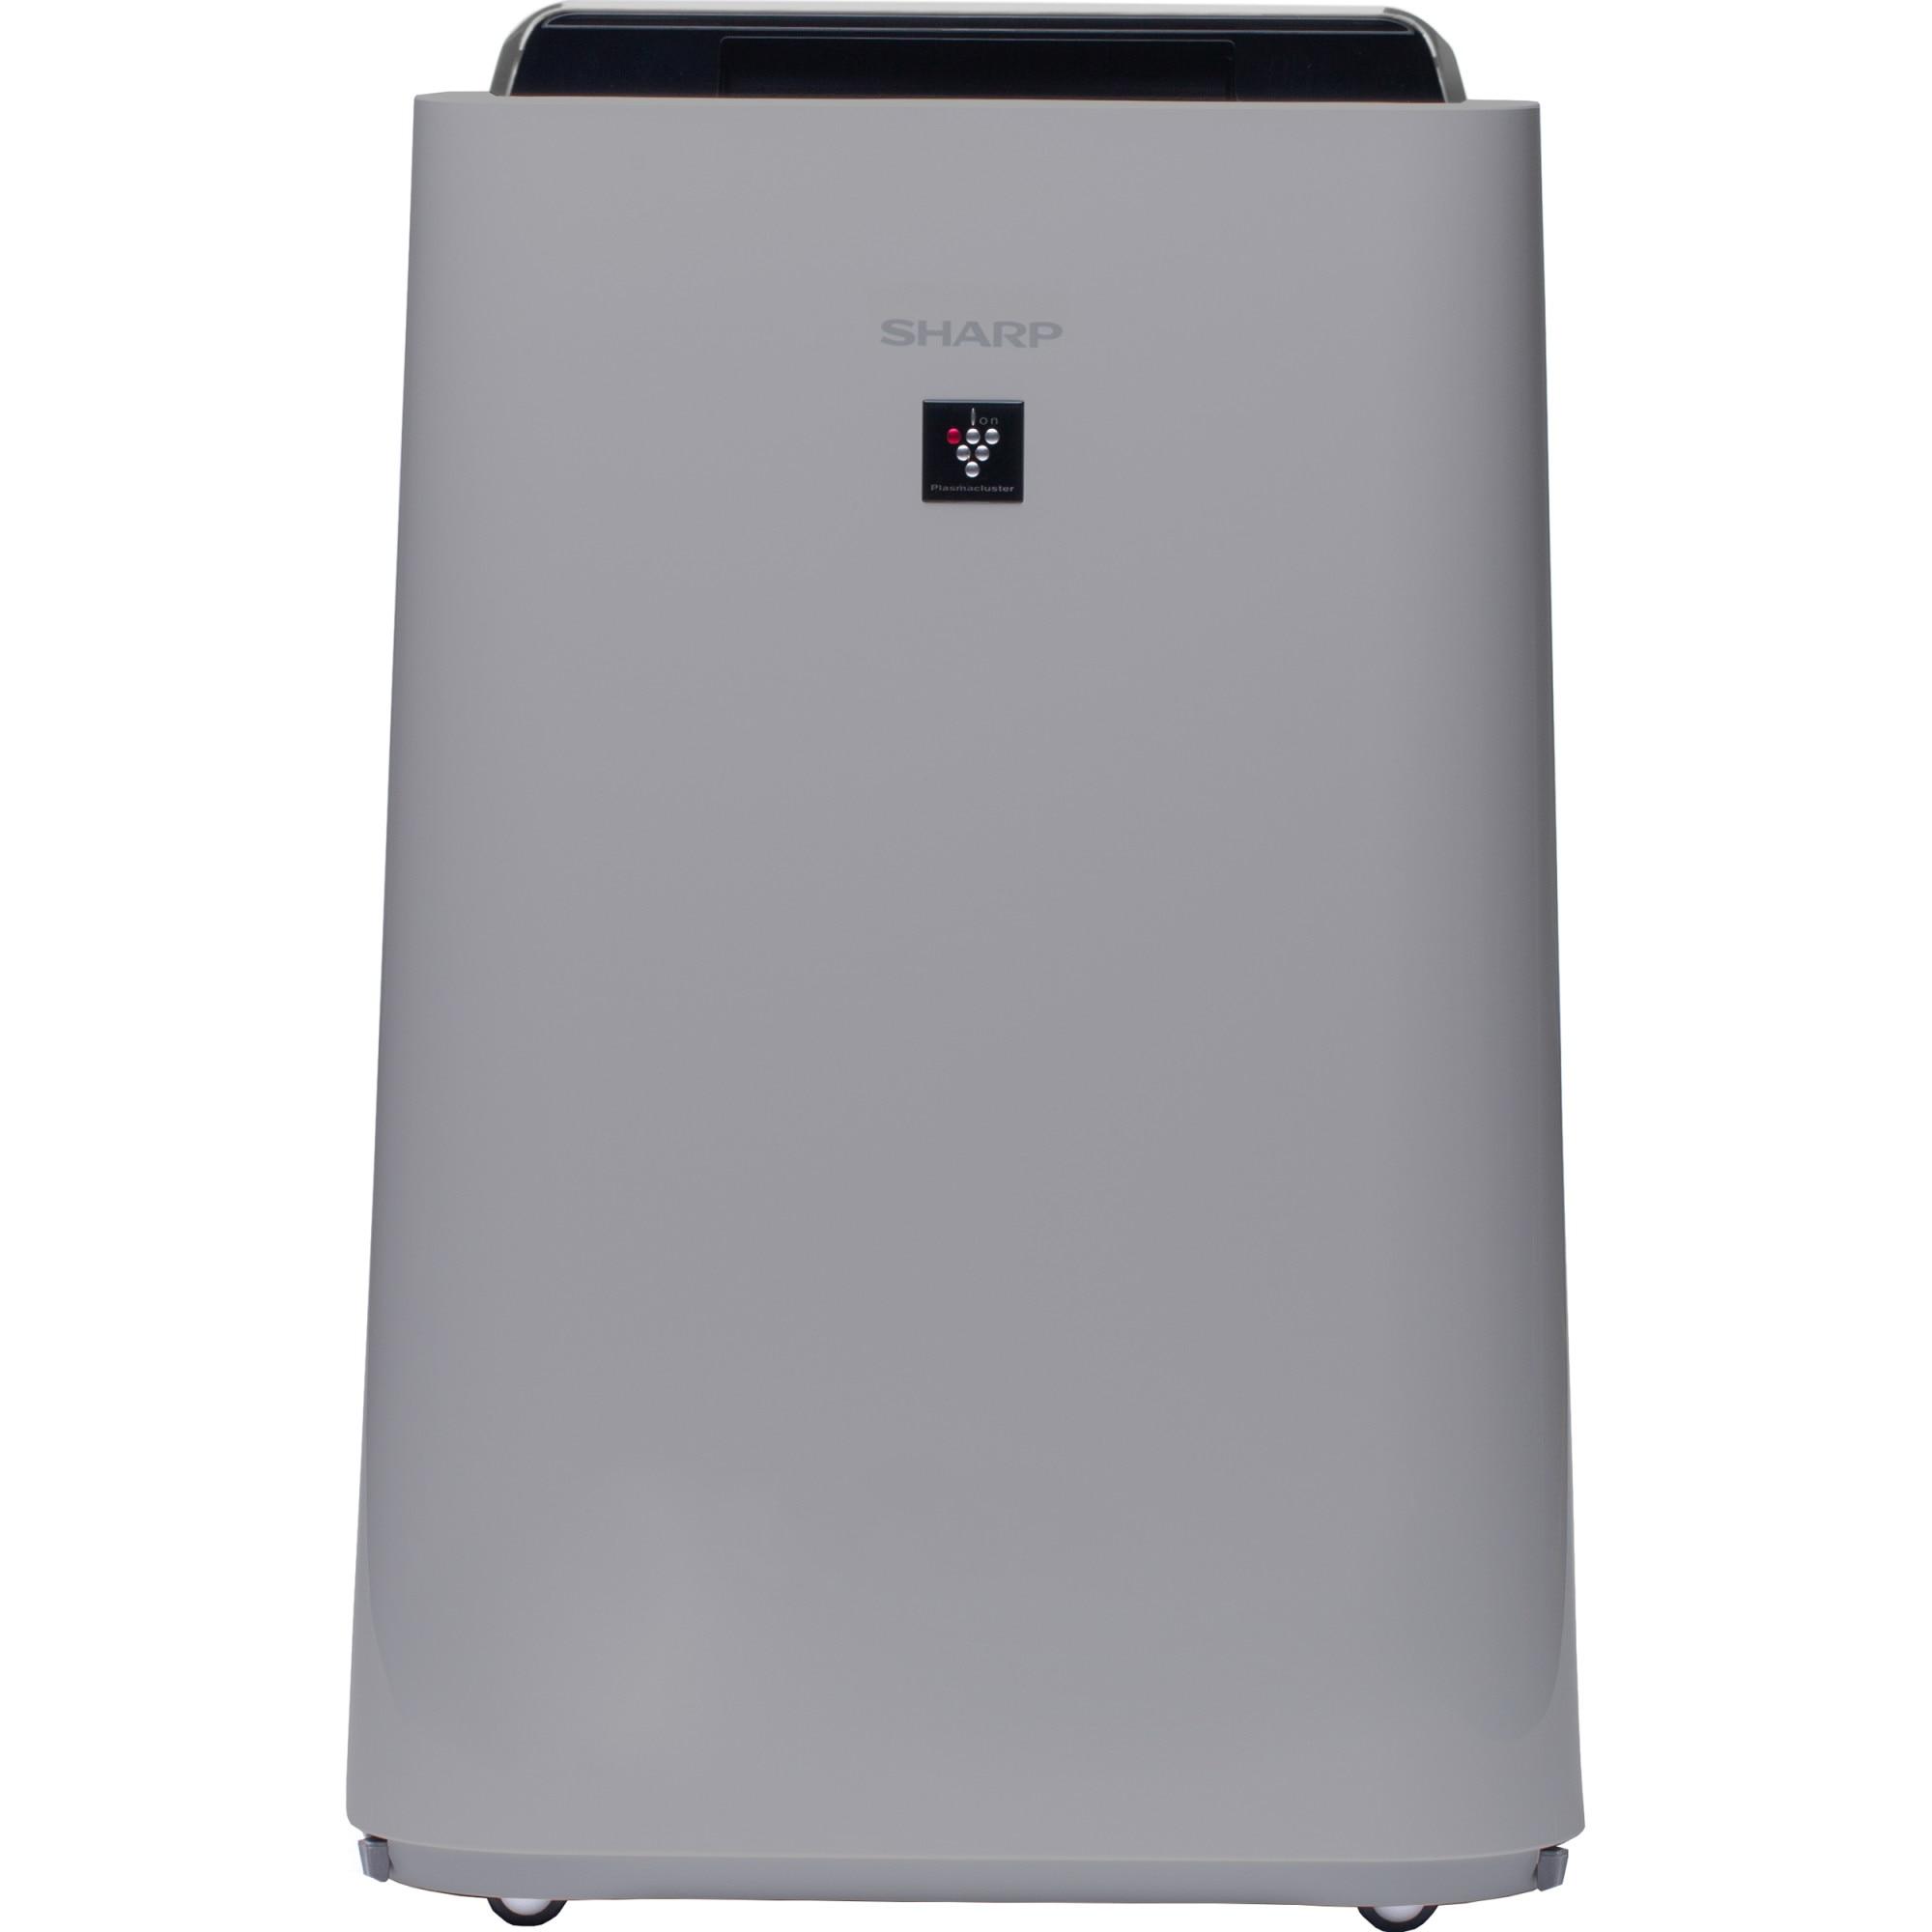 Fotografie Purificator de aer cu umidificator Sharp UA-HD50E-L, 4 modele de filtrare, 4 senzori de praf, Plasmacluster Ion Technology, 38m², alb